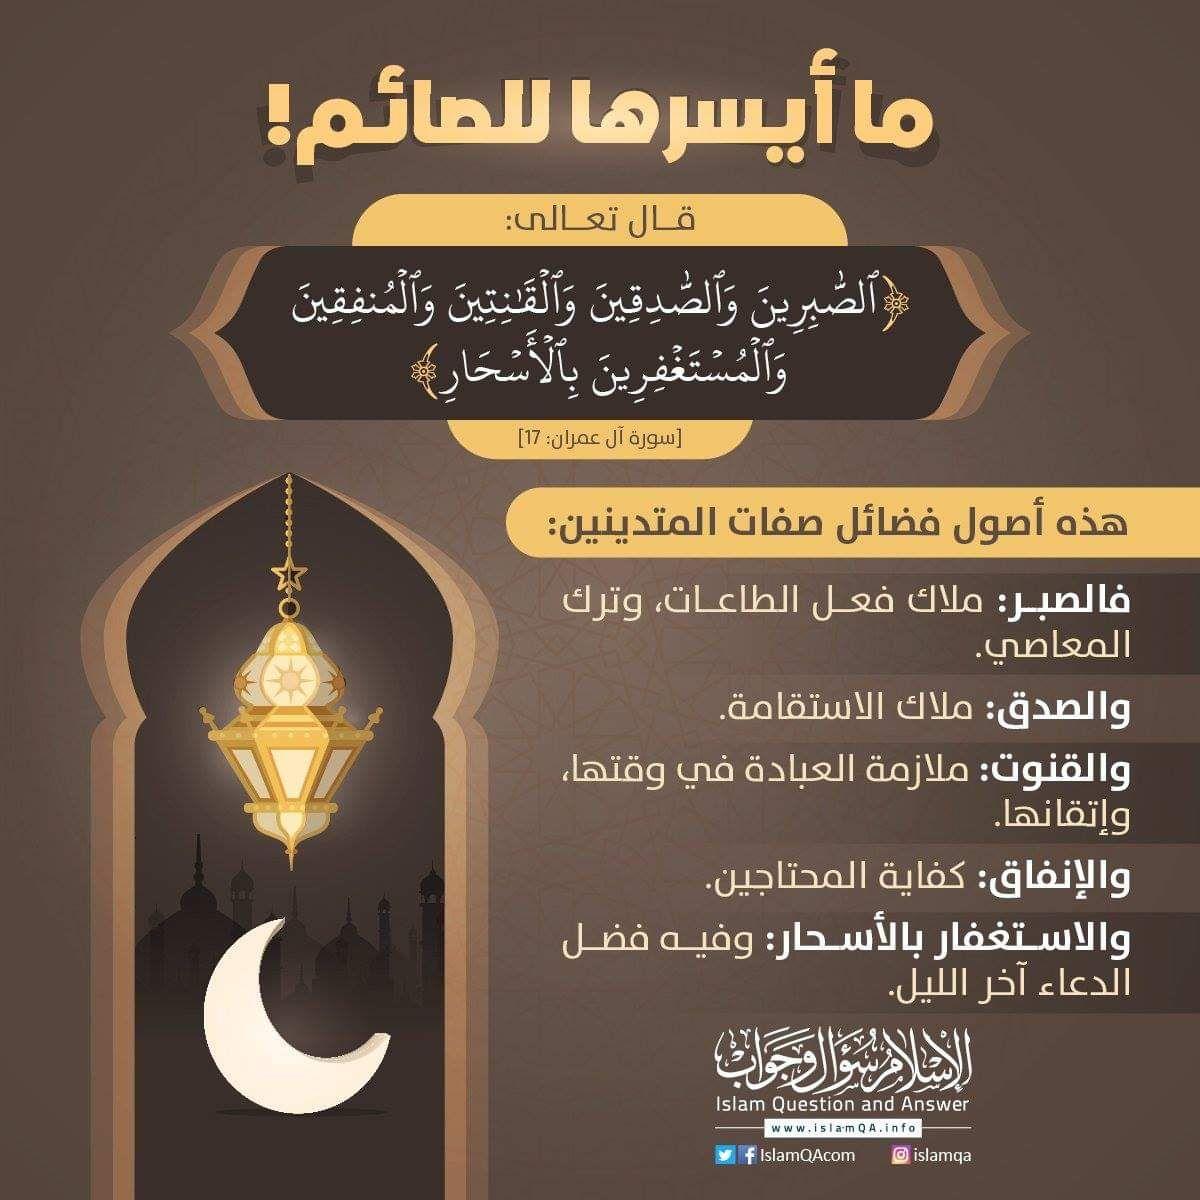 سمر الأرناؤوط Islamiyyat Twitter Islam Facts Beautiful Arabic Words Ramadan